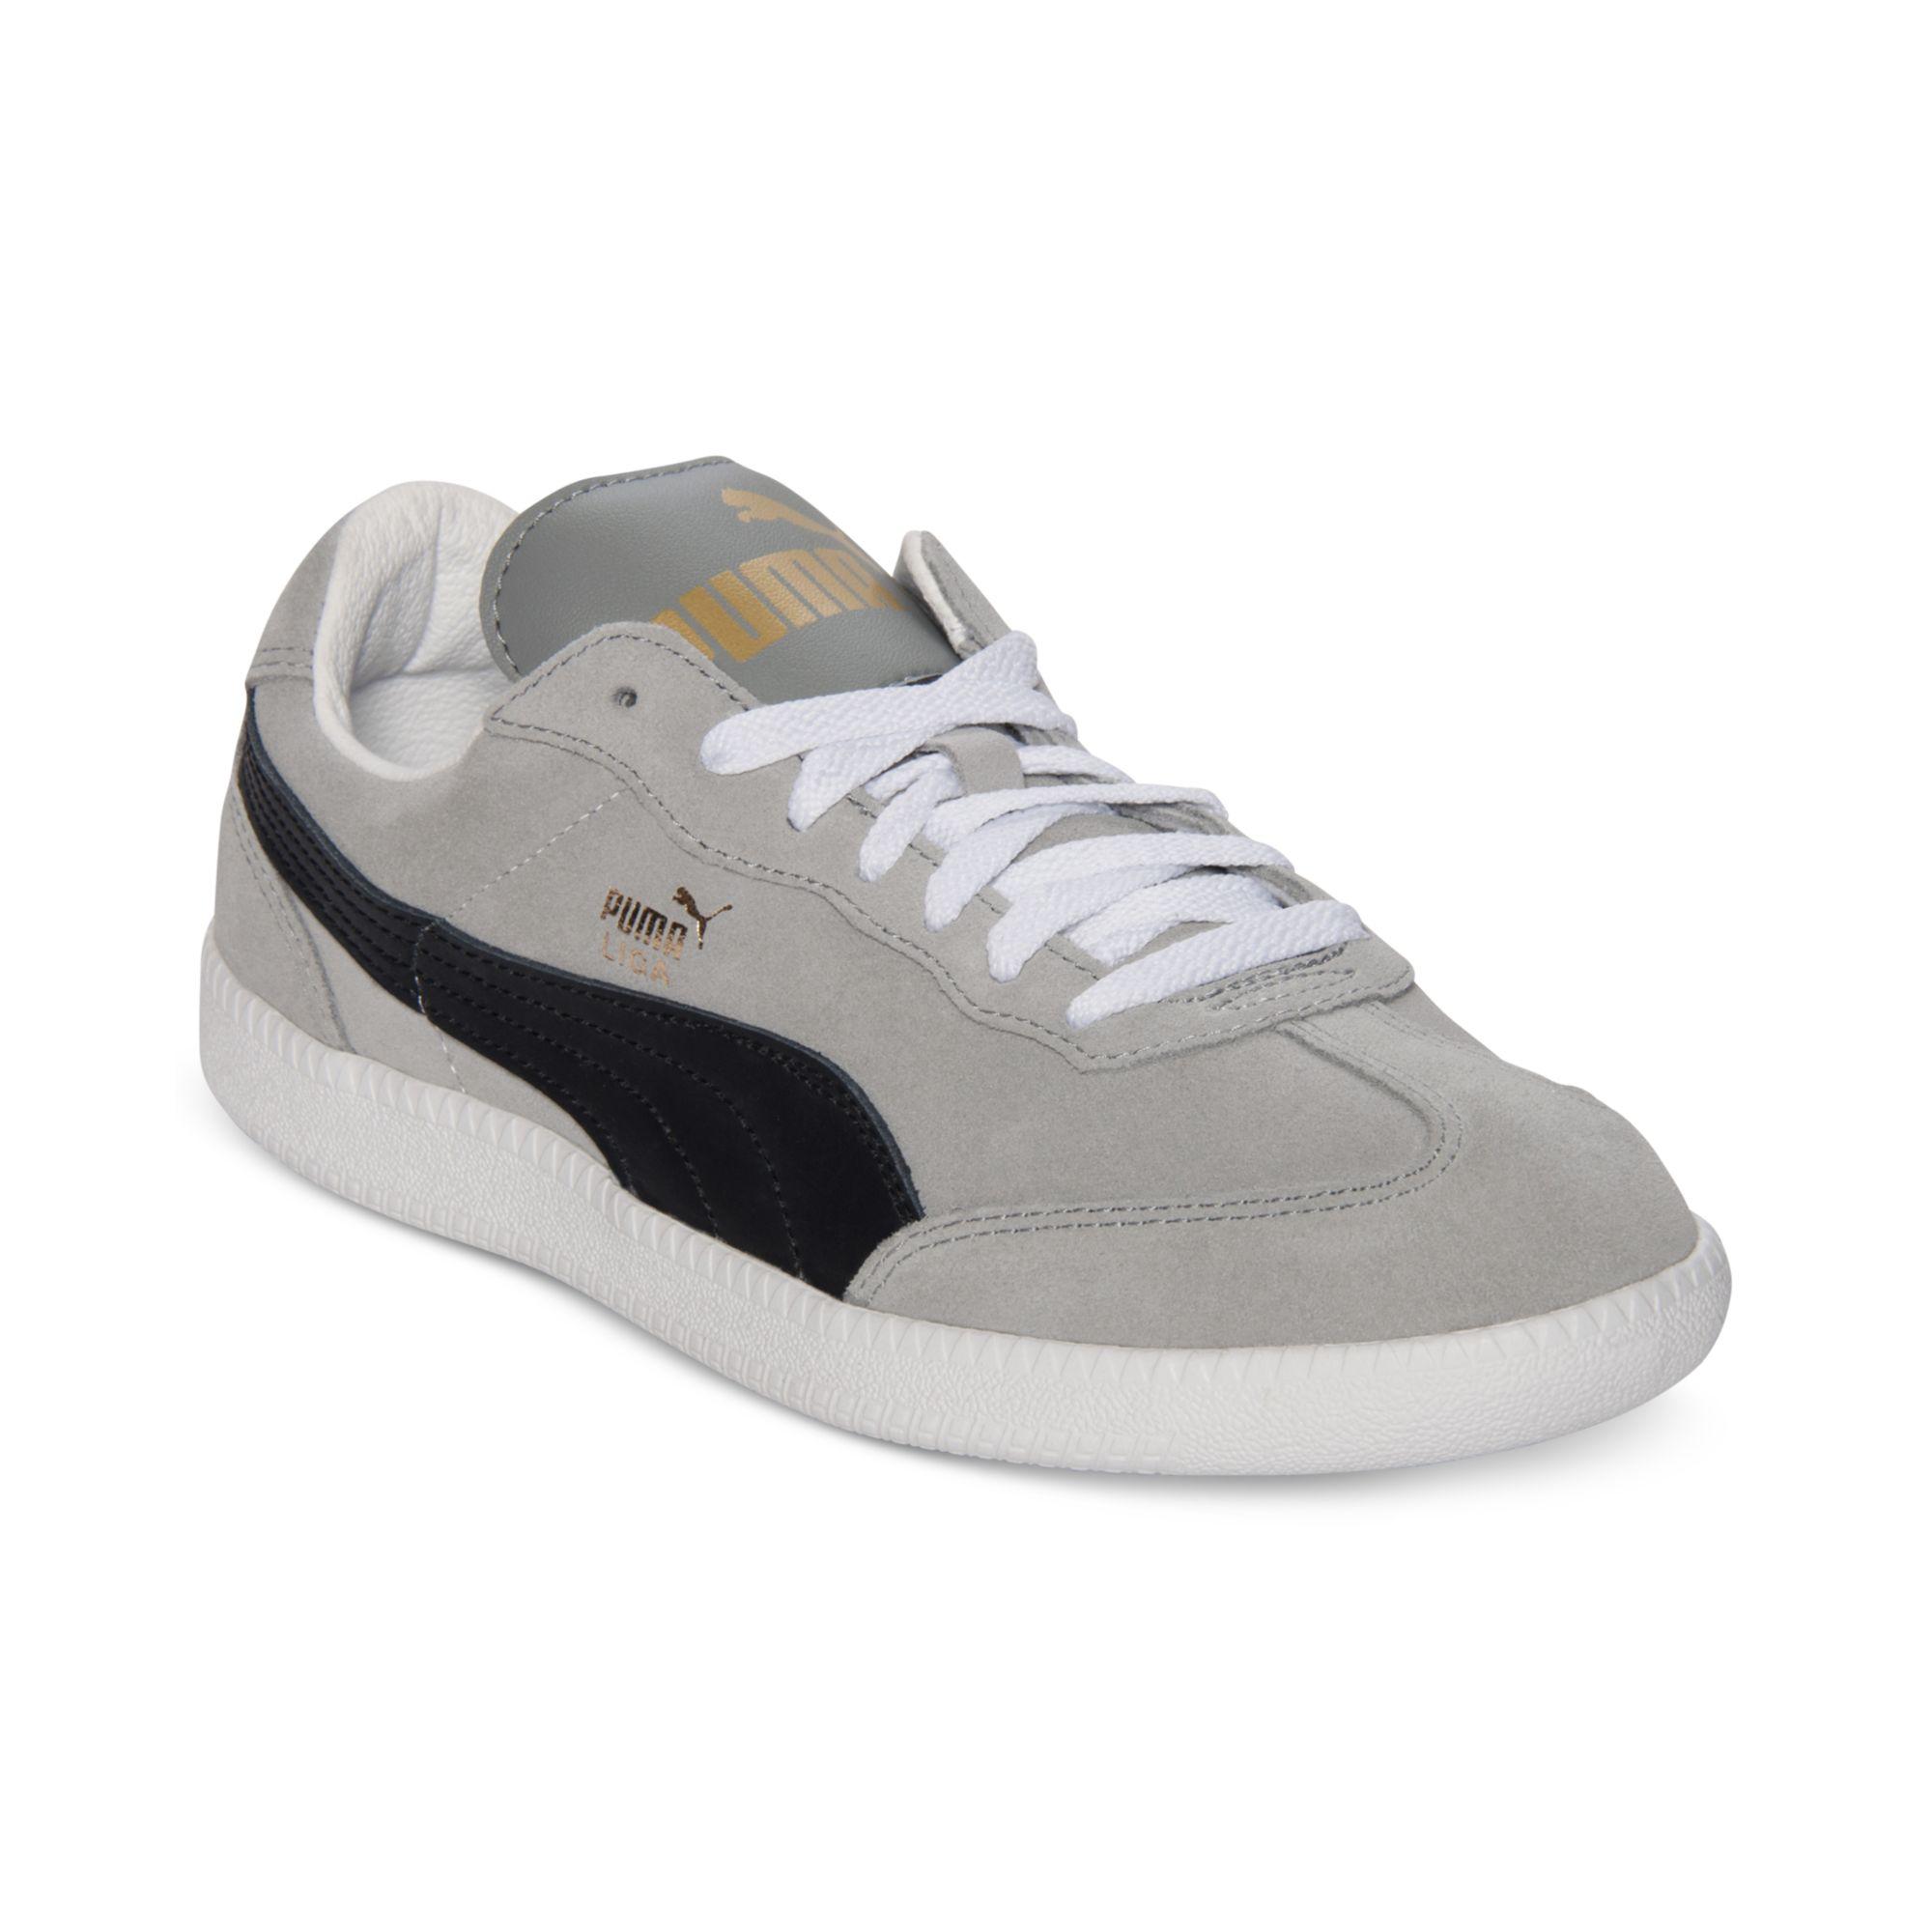 5e8b18942db In For Sneakers Liga Lyst Classic Casual Suede Puma Men Gray TFJ1lKc3